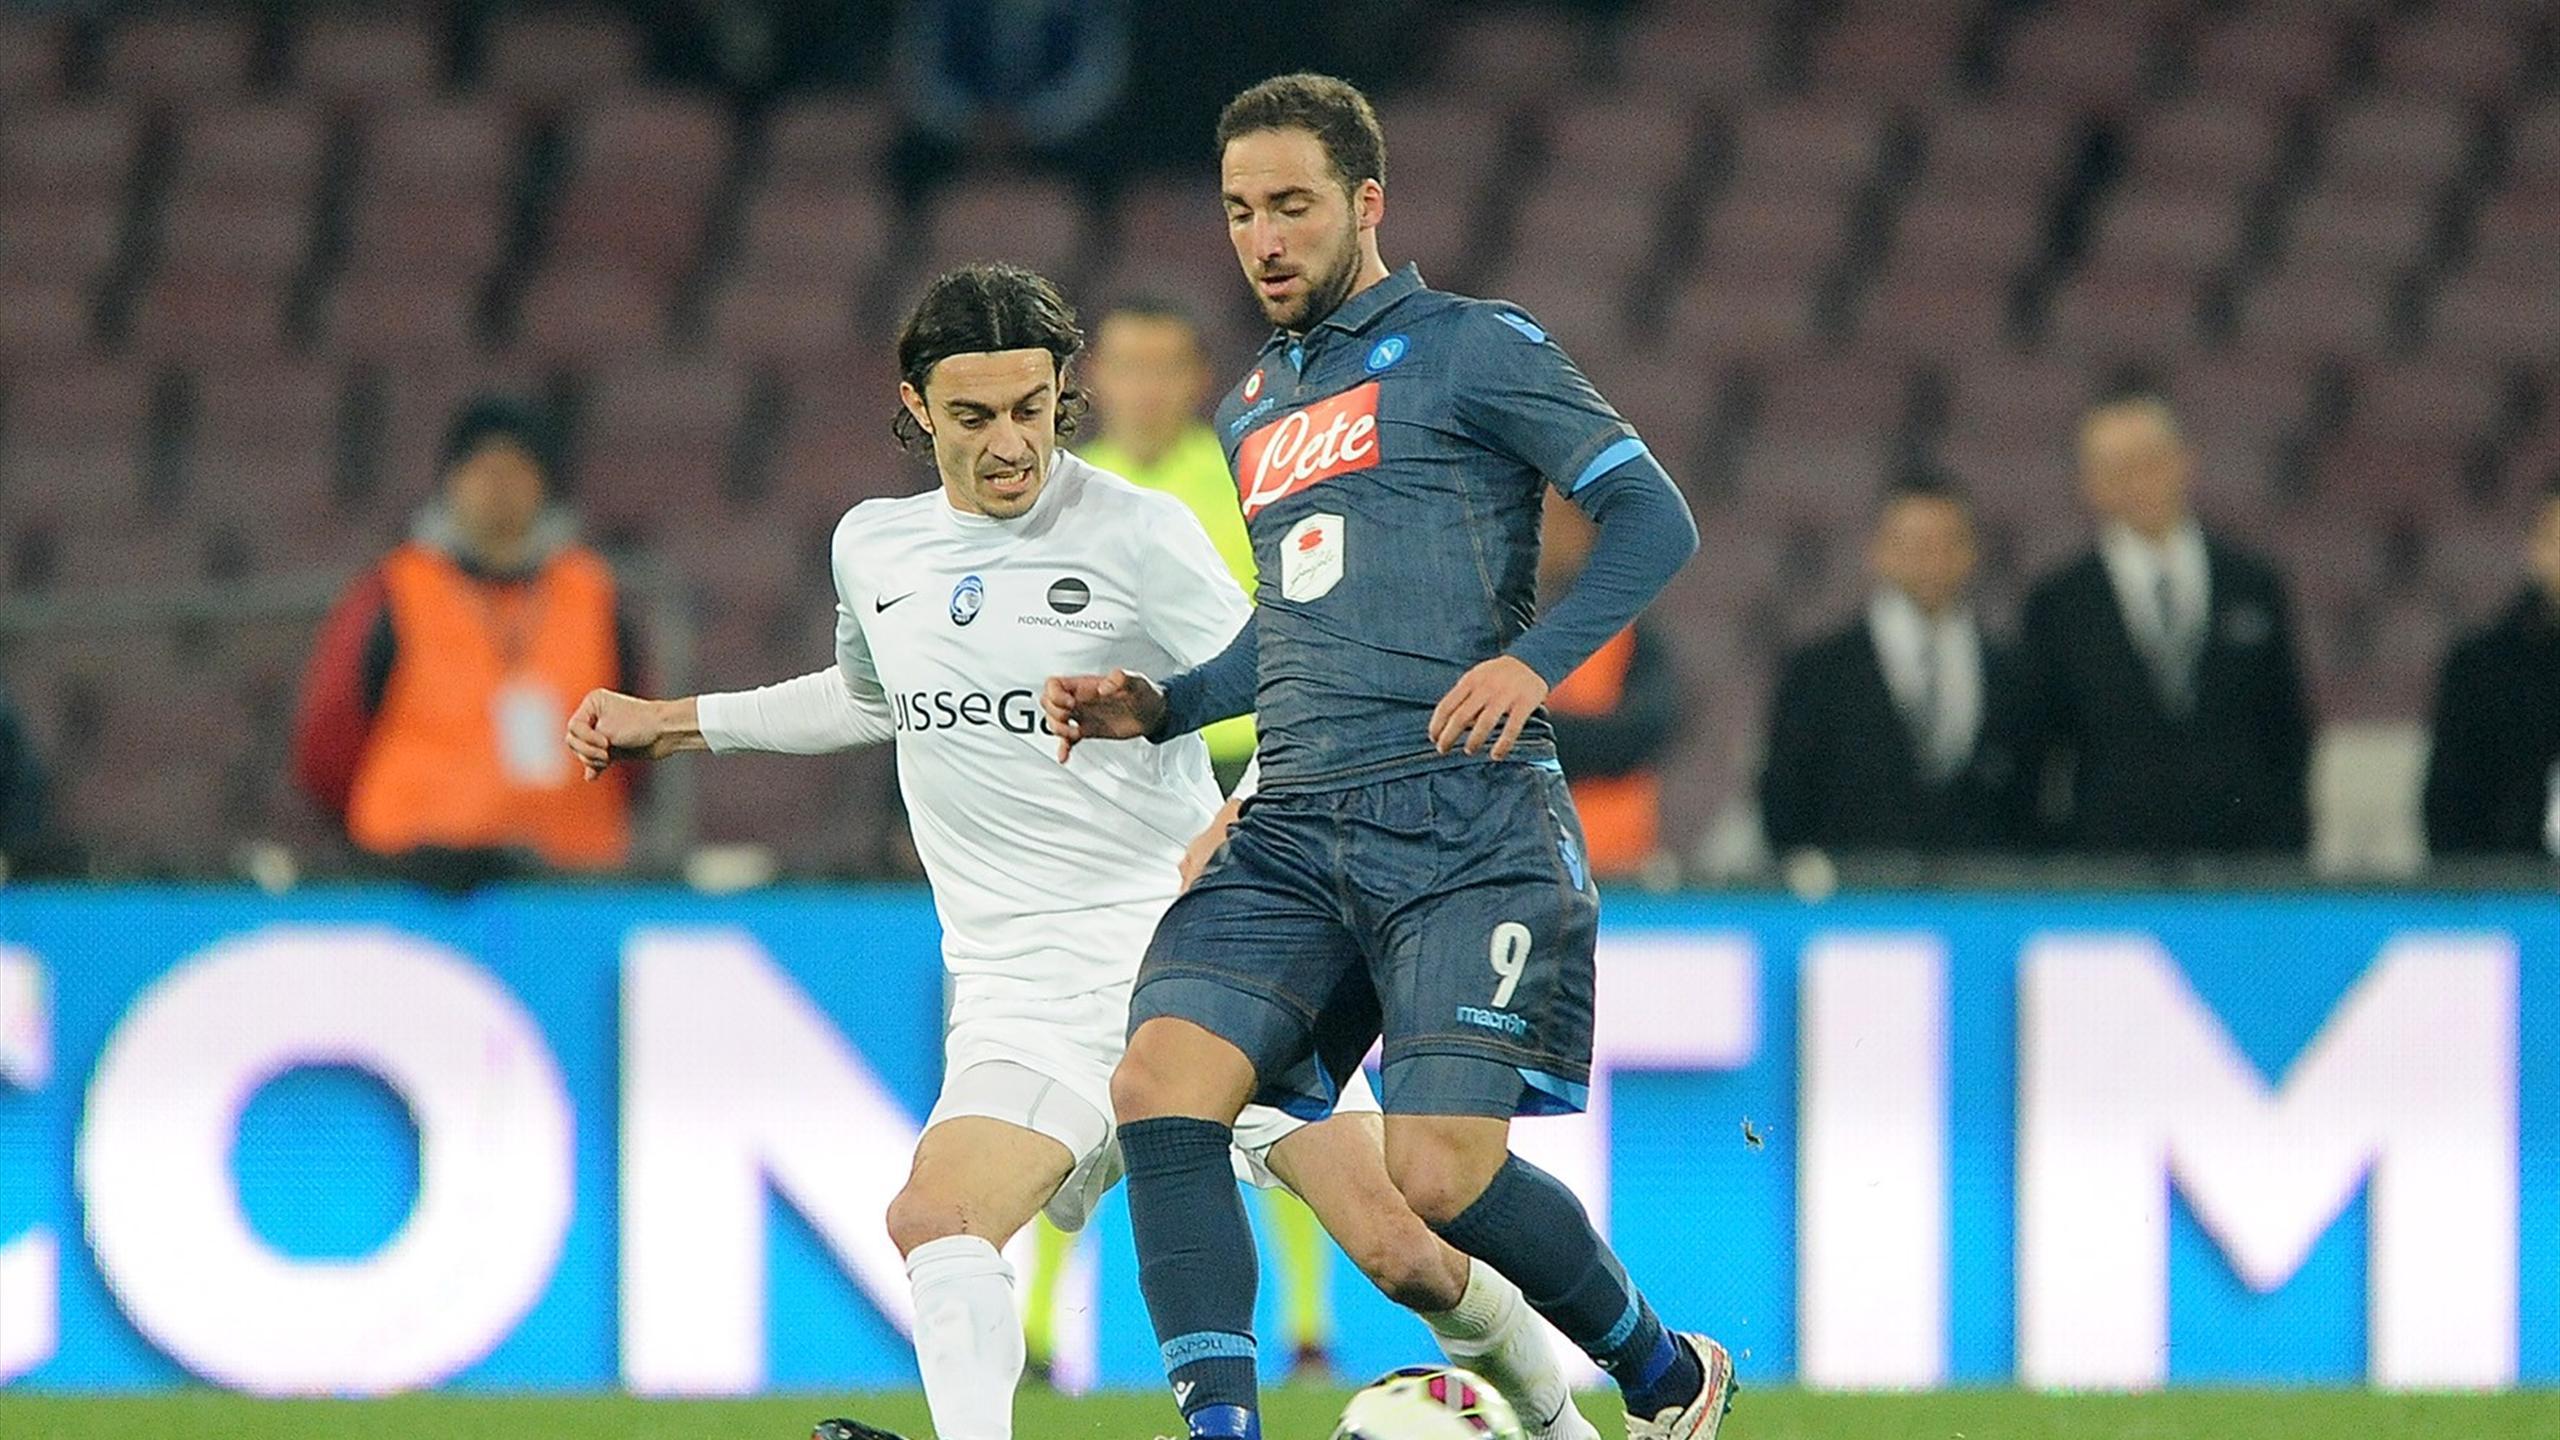 Video: Napoli vs Atalanta